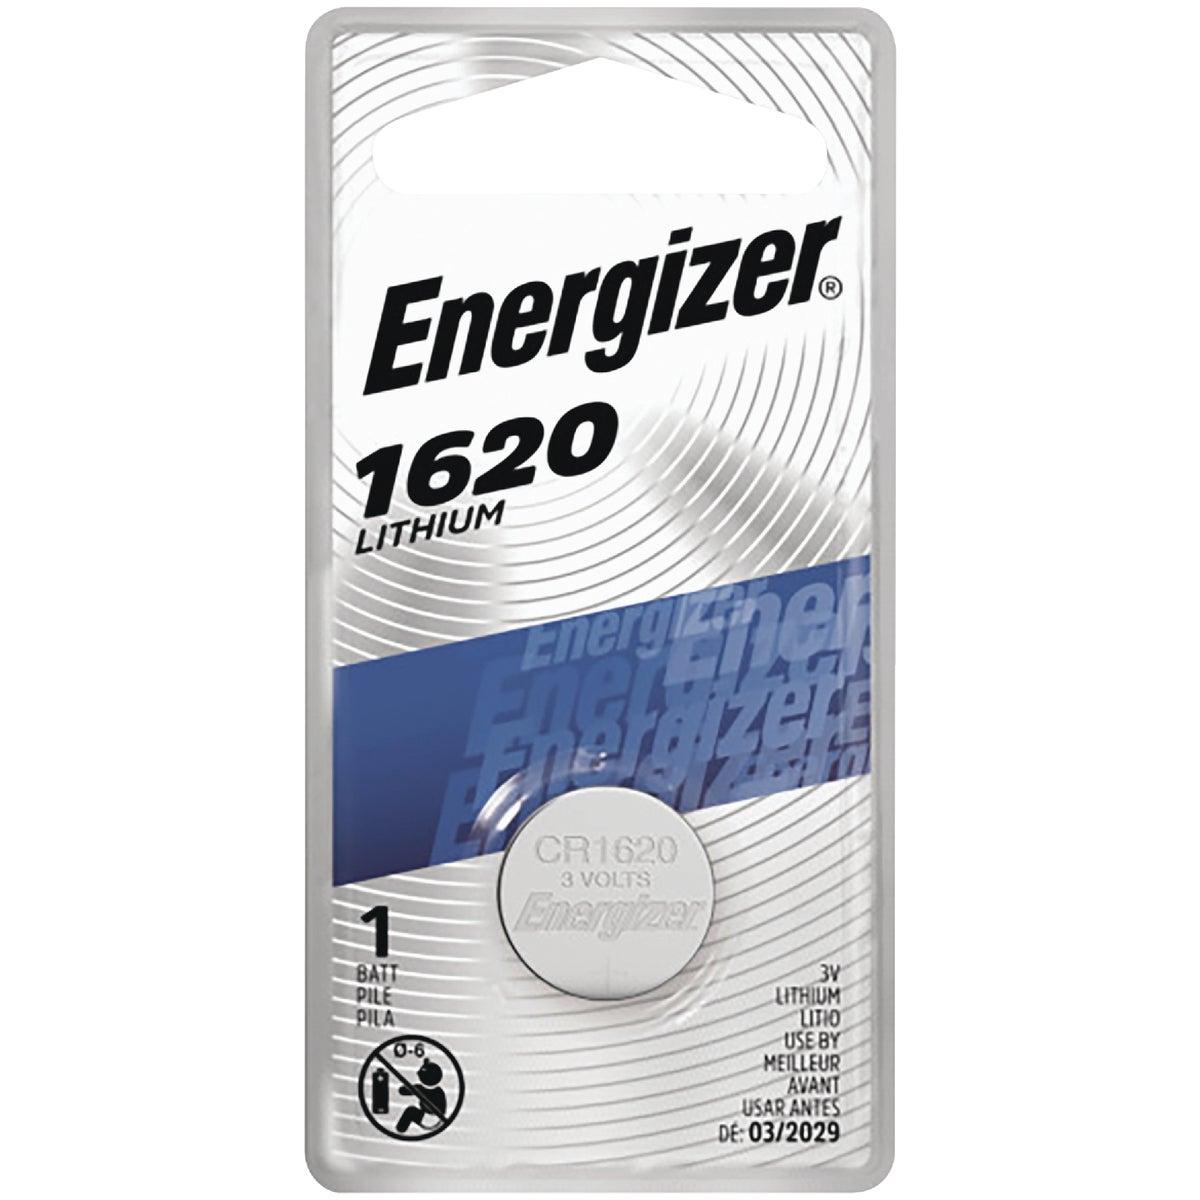 3V WTCH/ELEC LITHIUM BAT - ECR1620BP by Energizer